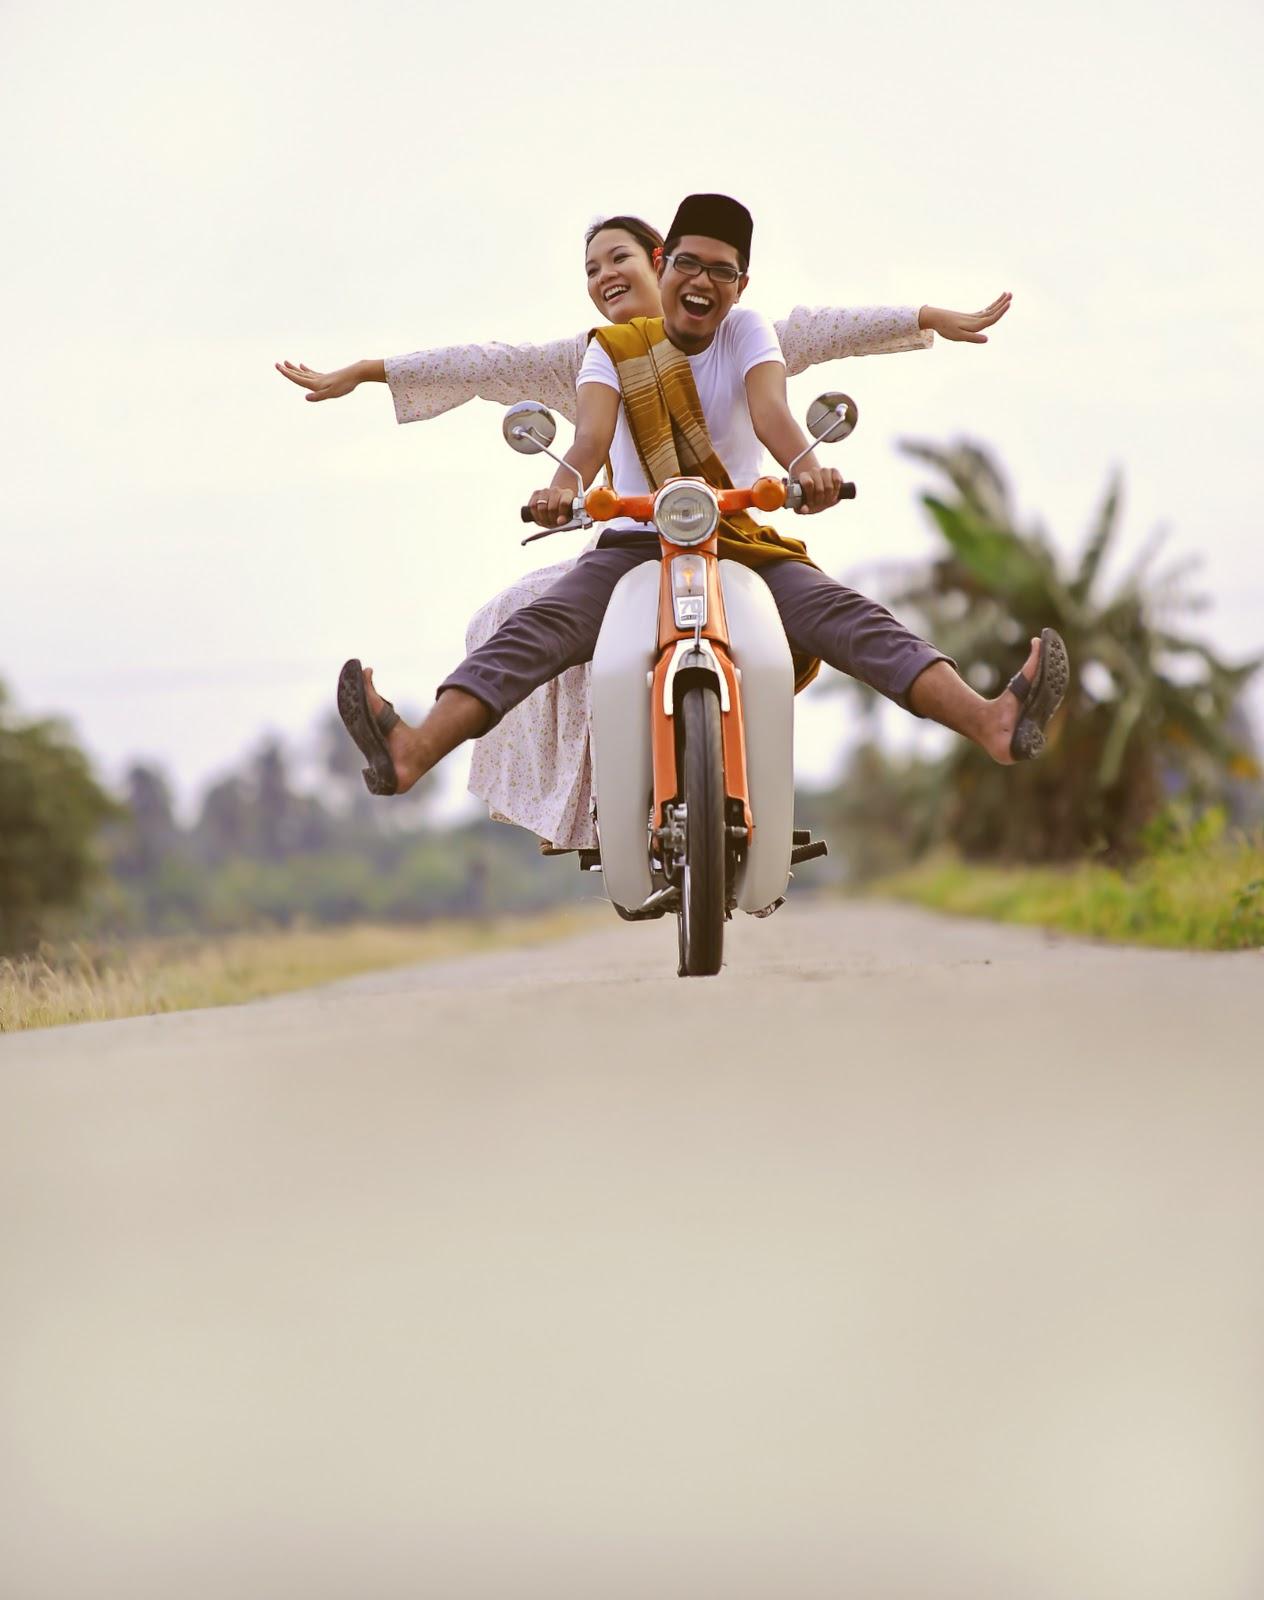 Puteh Studio: Tips for Pre Wedding Photo Shoot